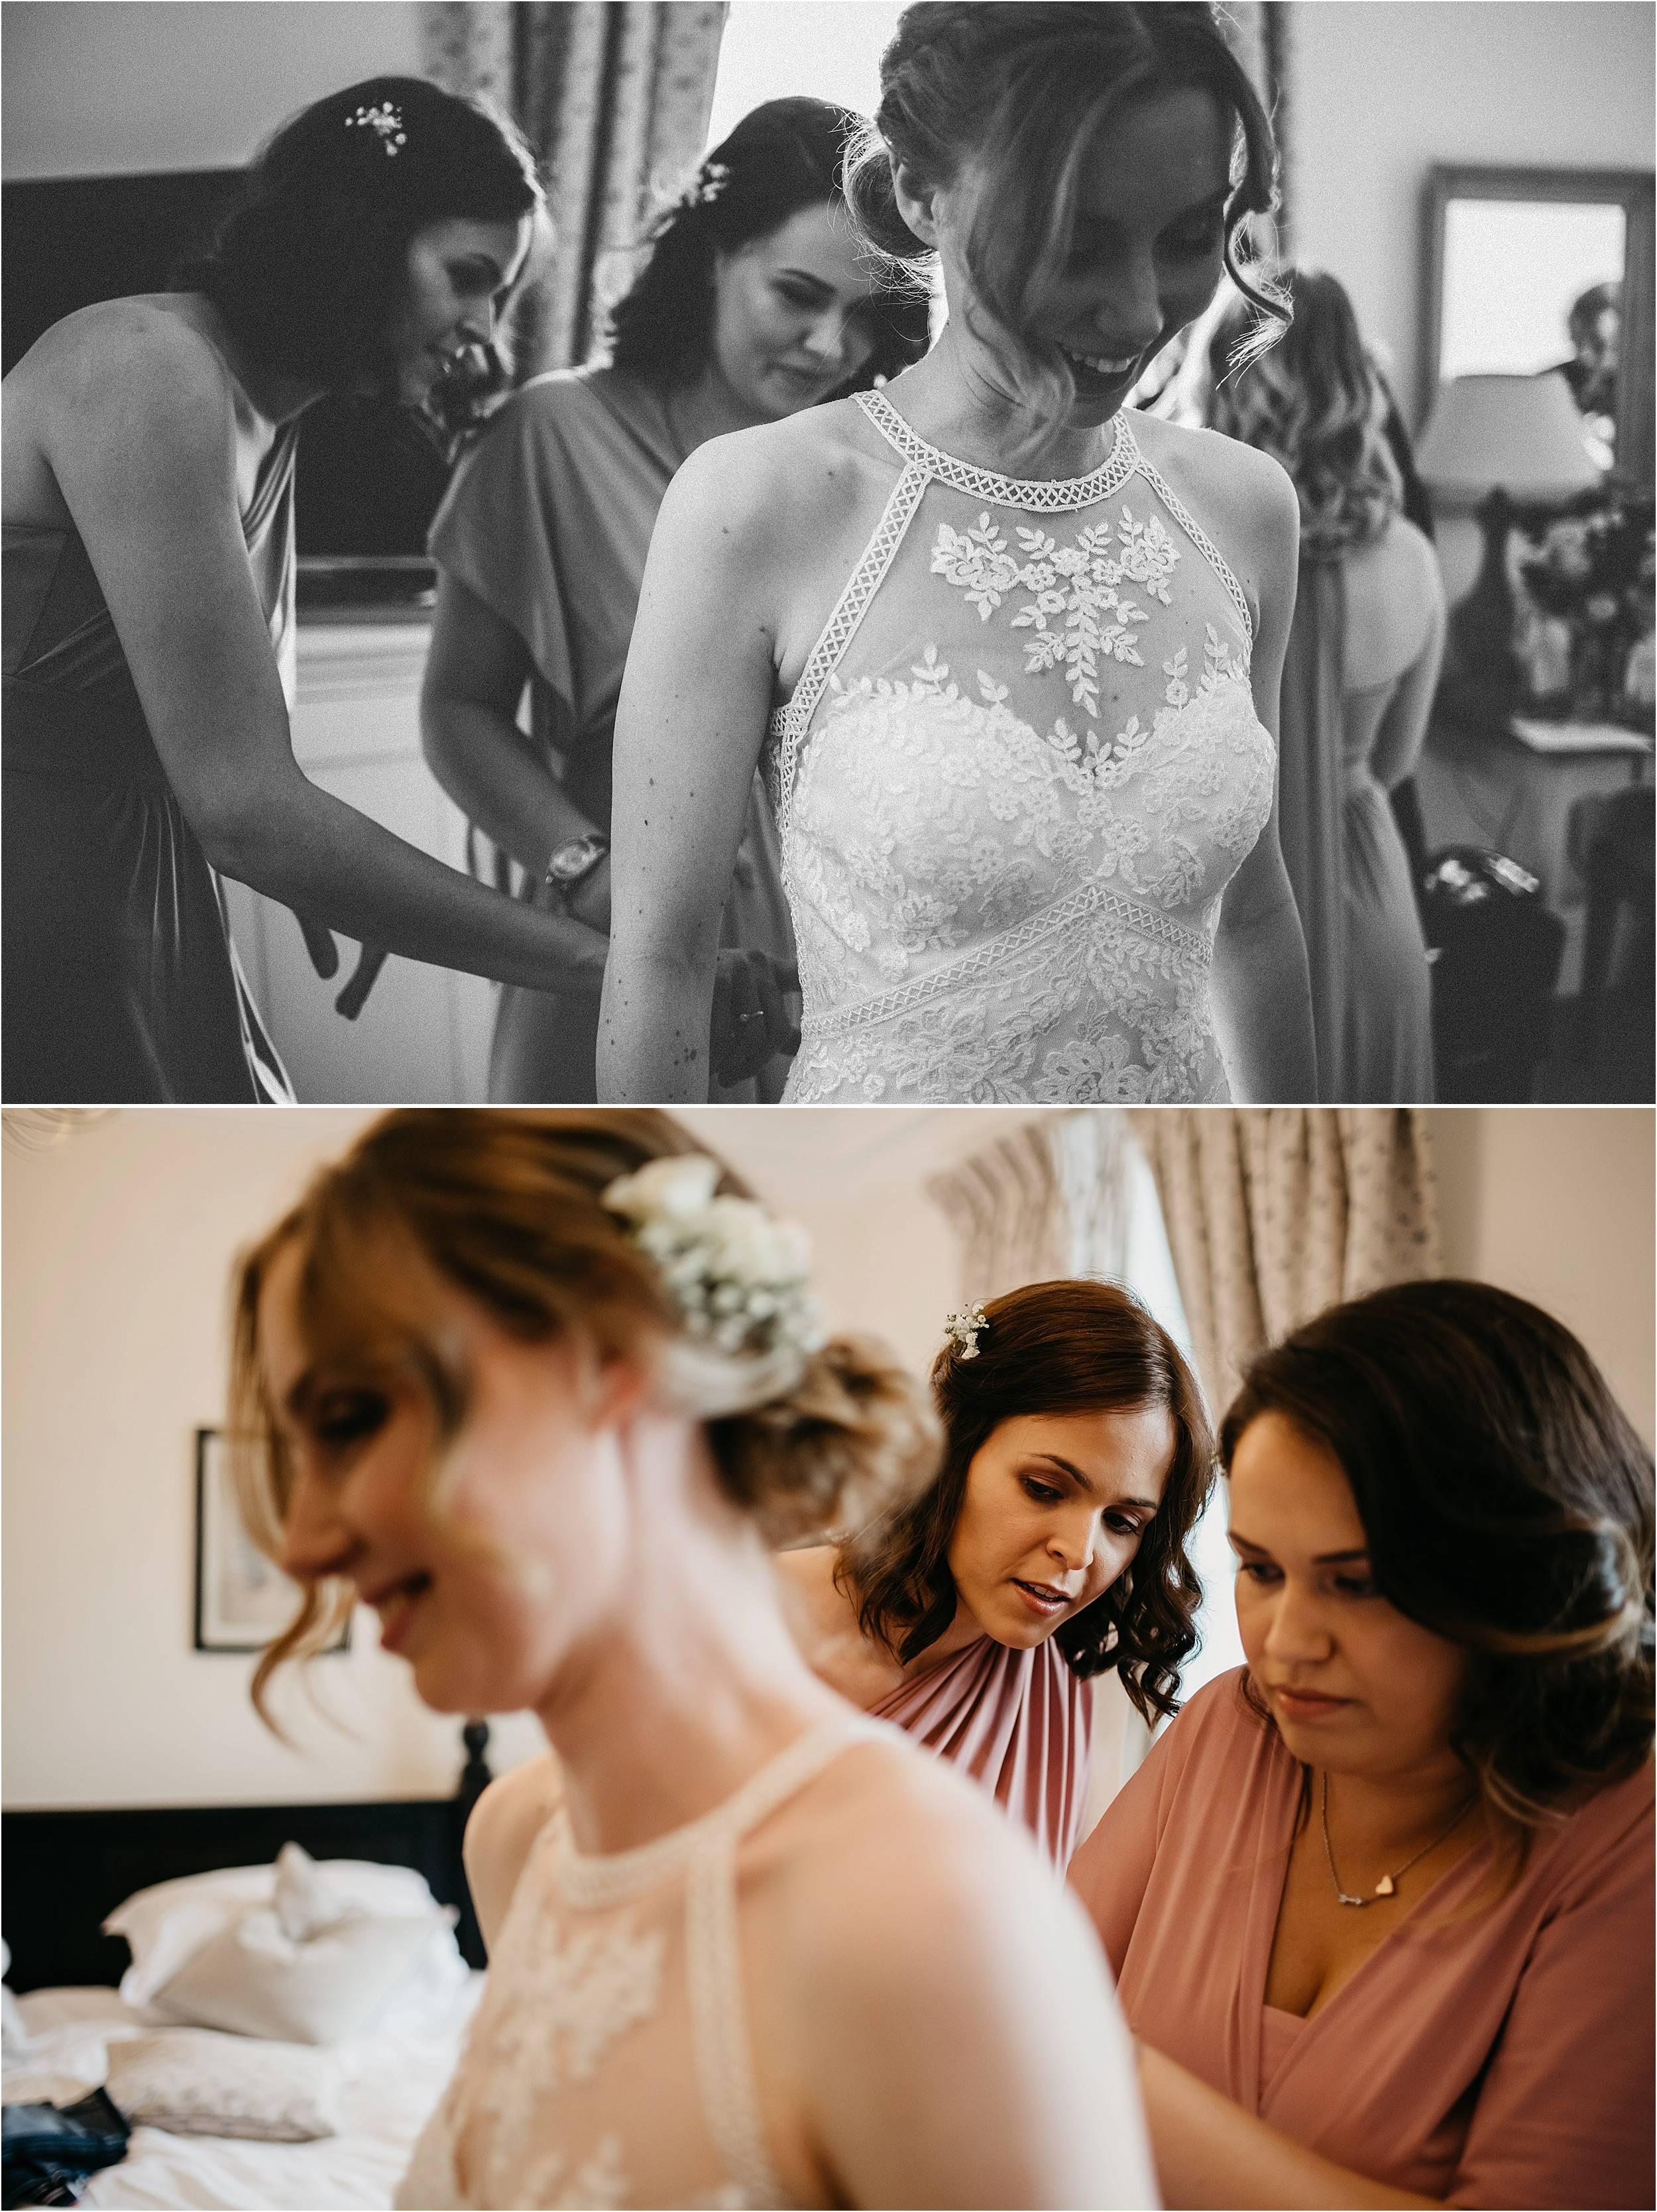 Kedleston Country House Wedding Photography_0027.jpg